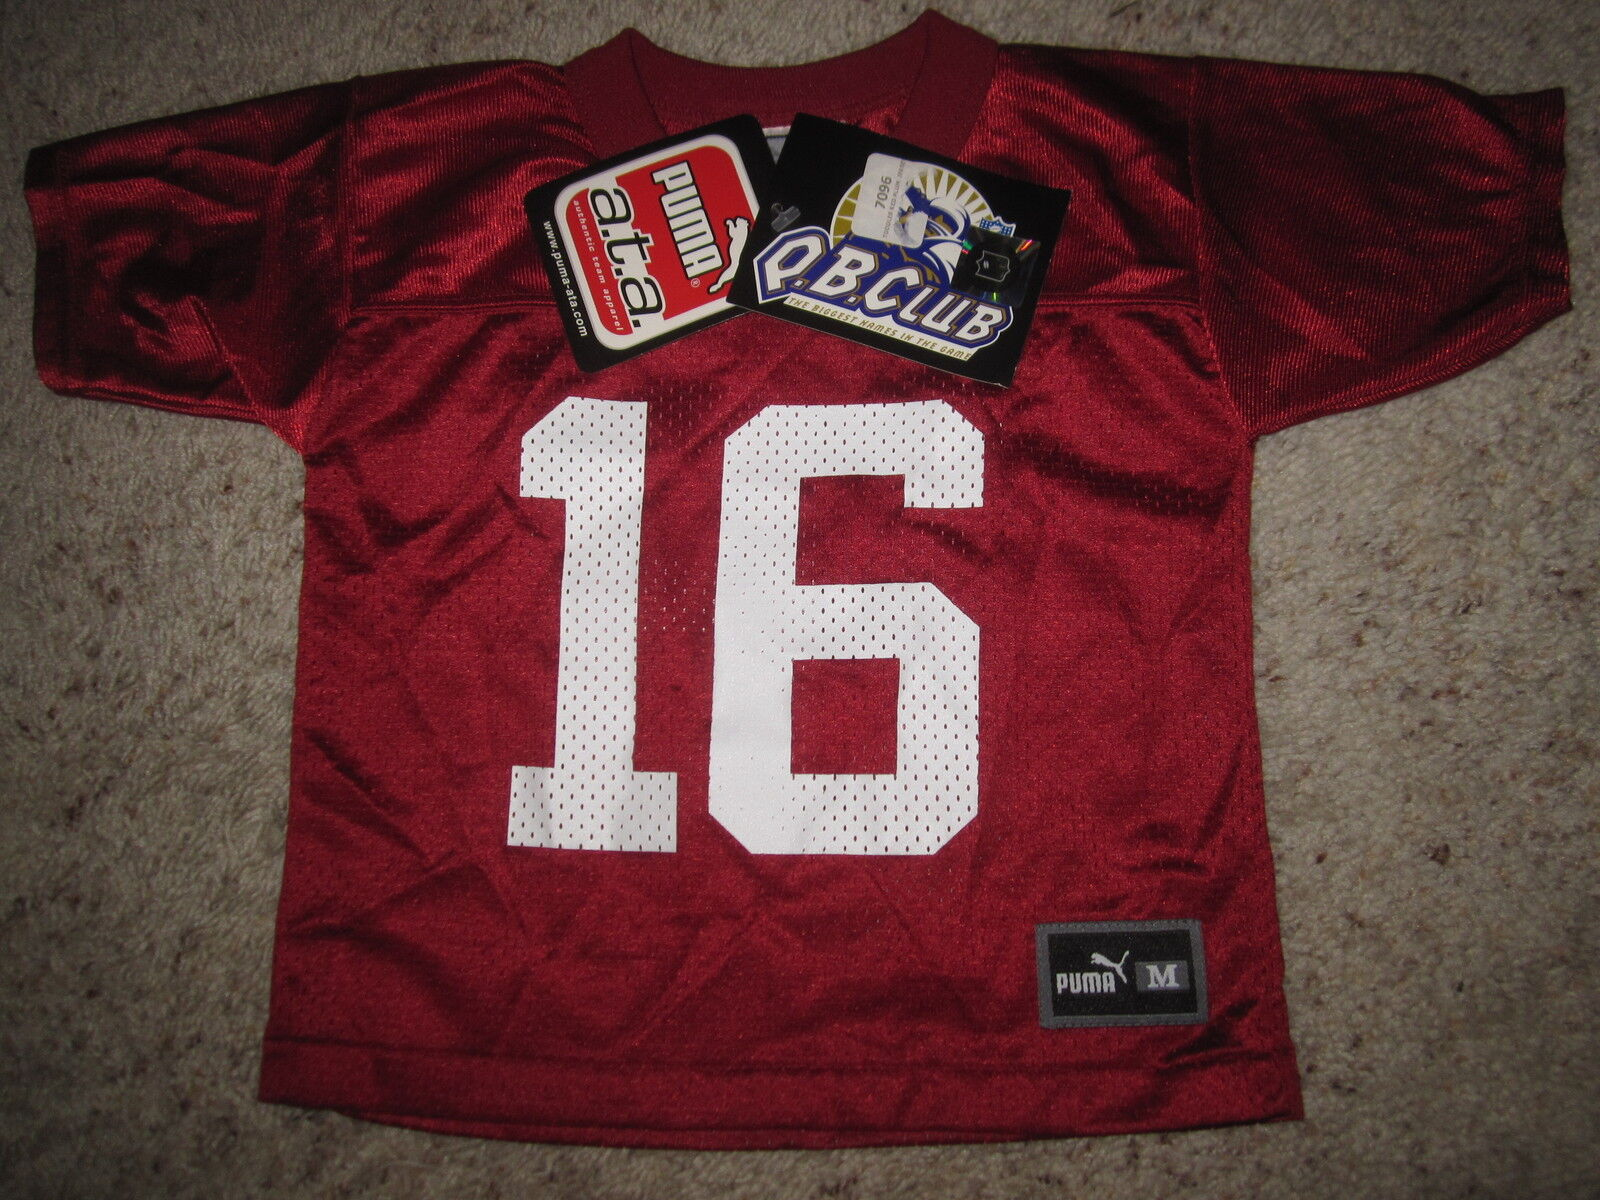 Jake Plummer Arizona Cardinals NFL Puma Camiseta Niño 3t Nuevo